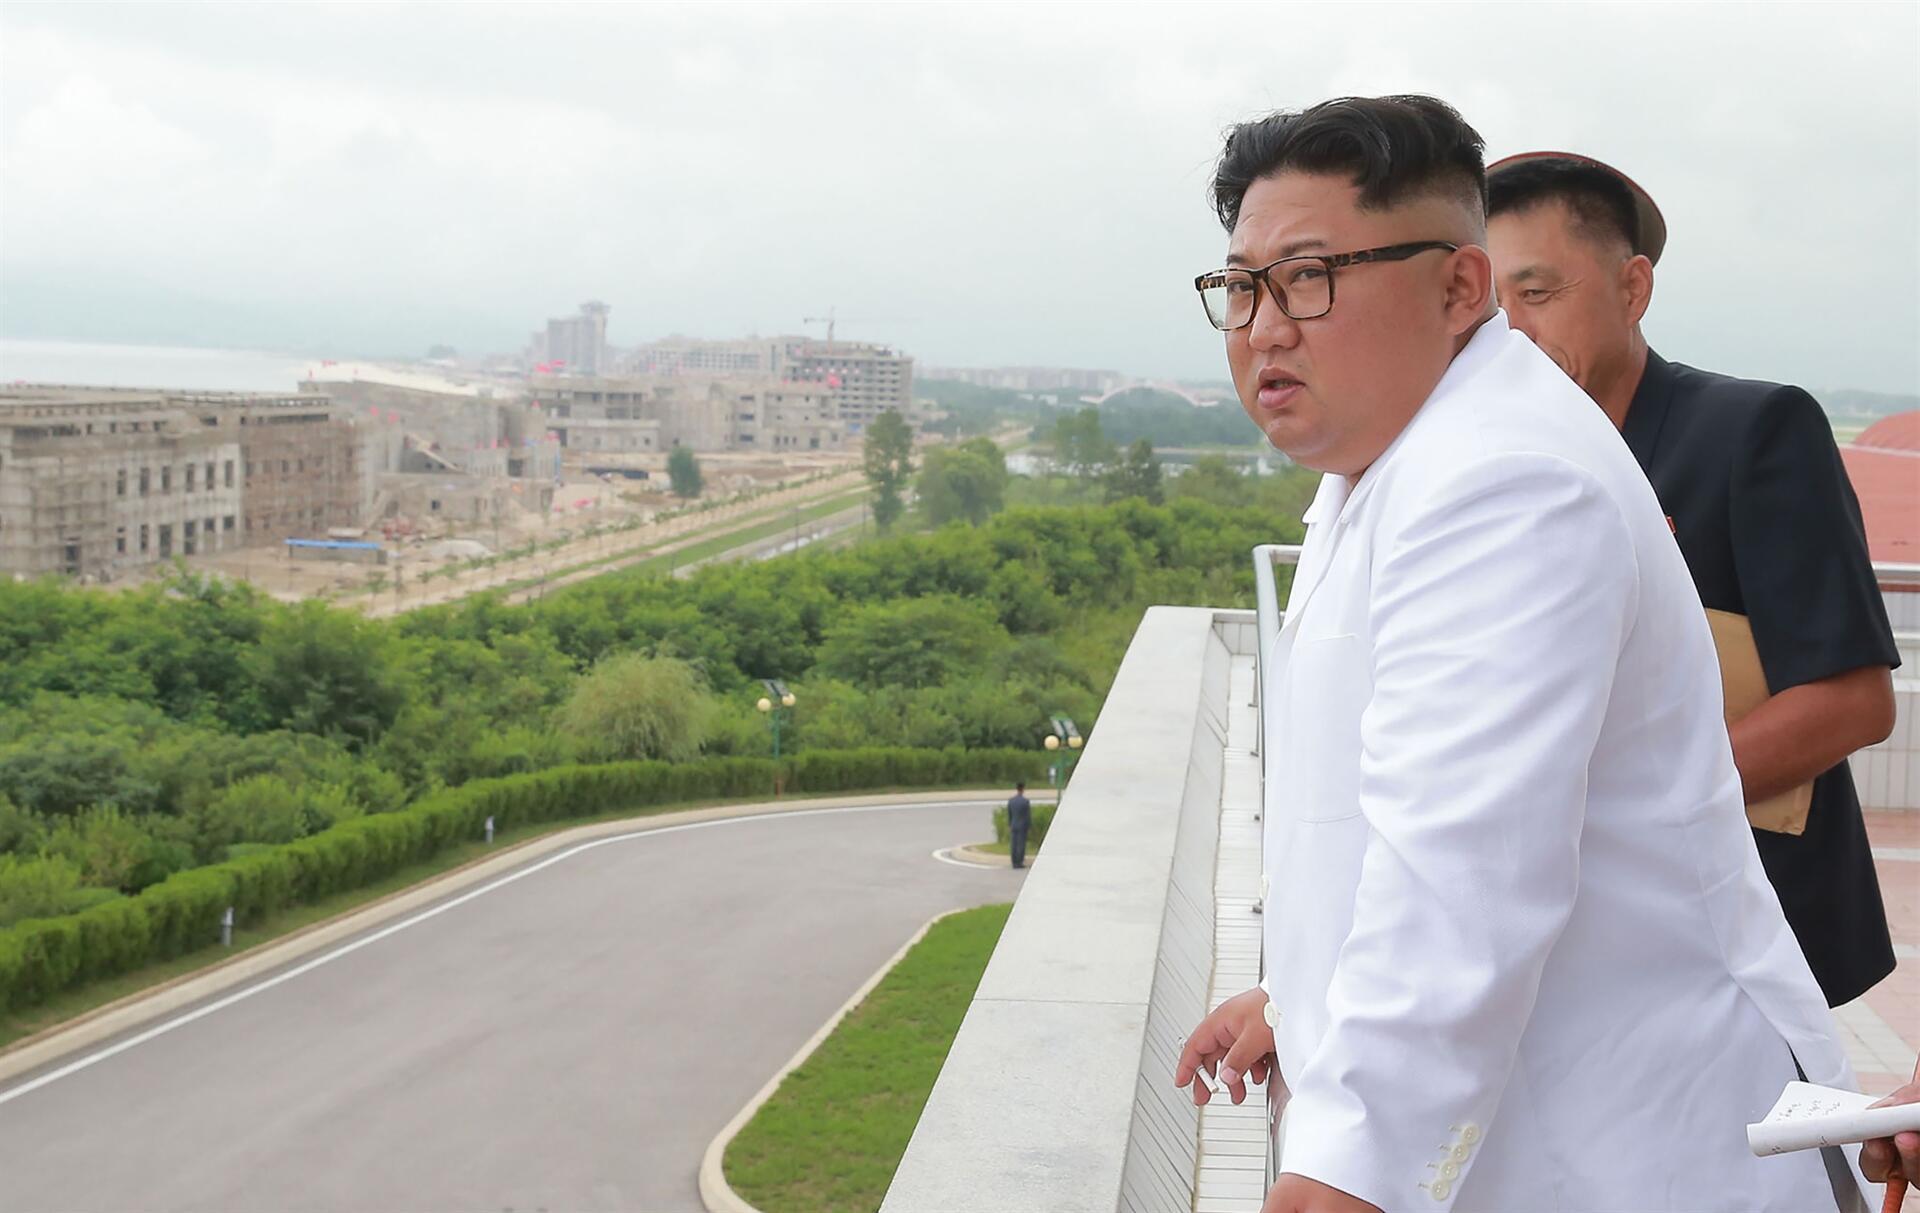 North Korea leader lambasts 'brigandish' sanctions: KCNA - World News